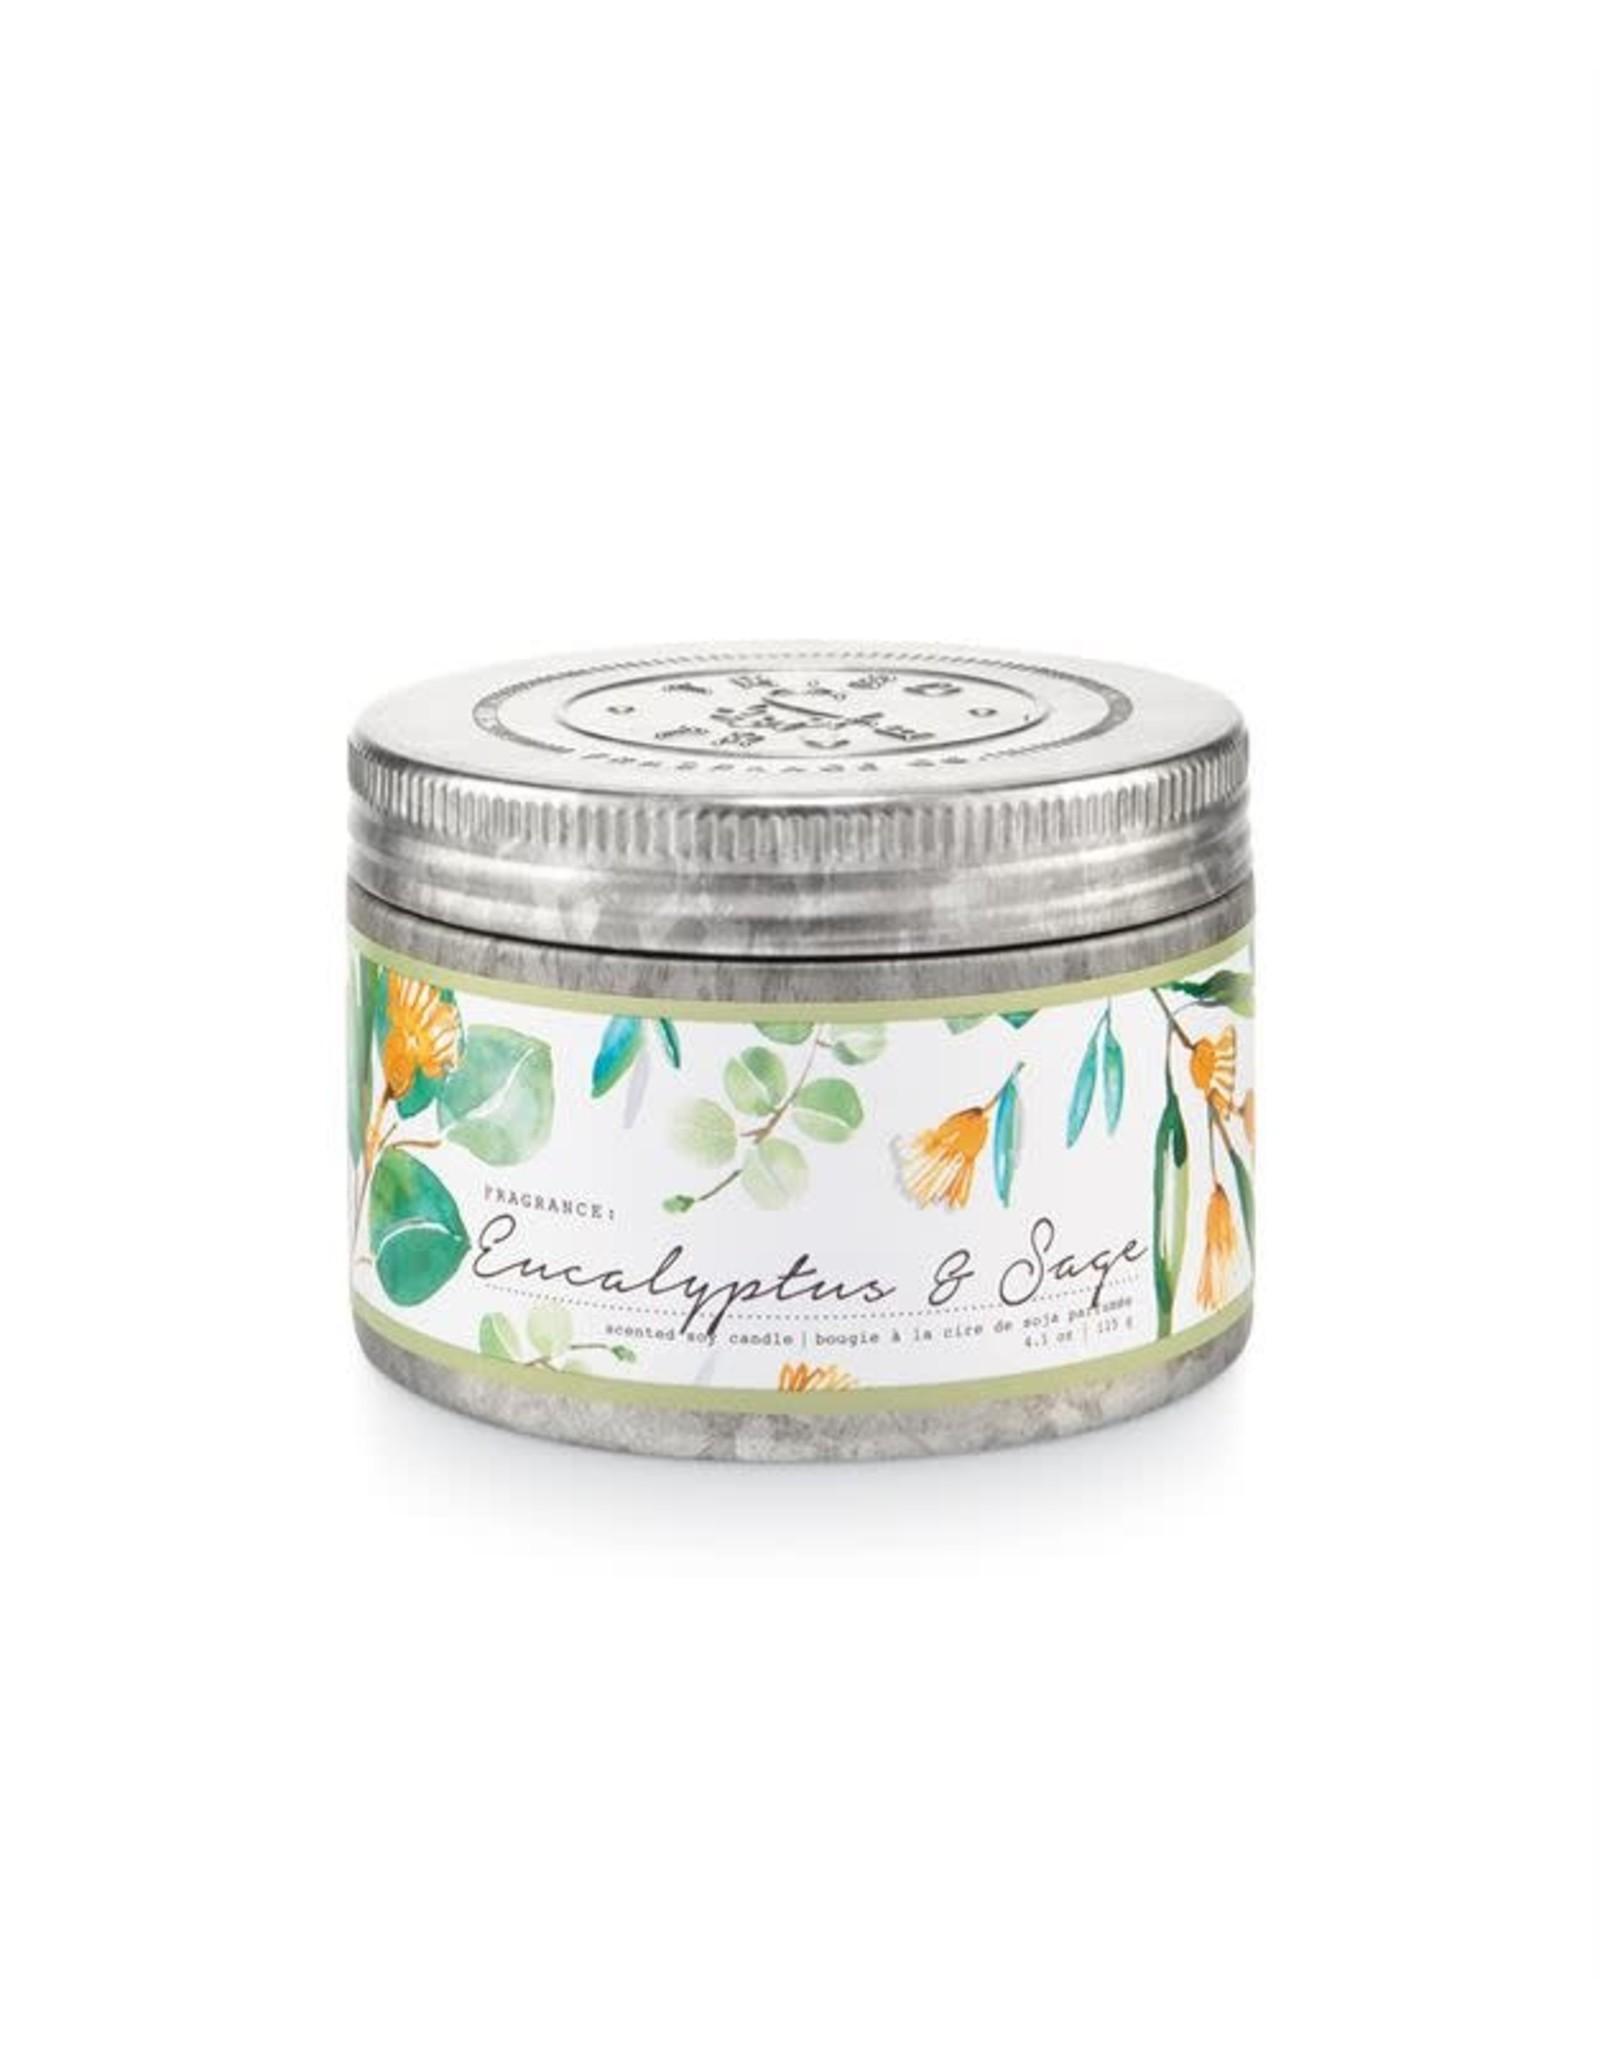 Tried & True 4.1 oz Tin Candle - Eucalyptus & Sage